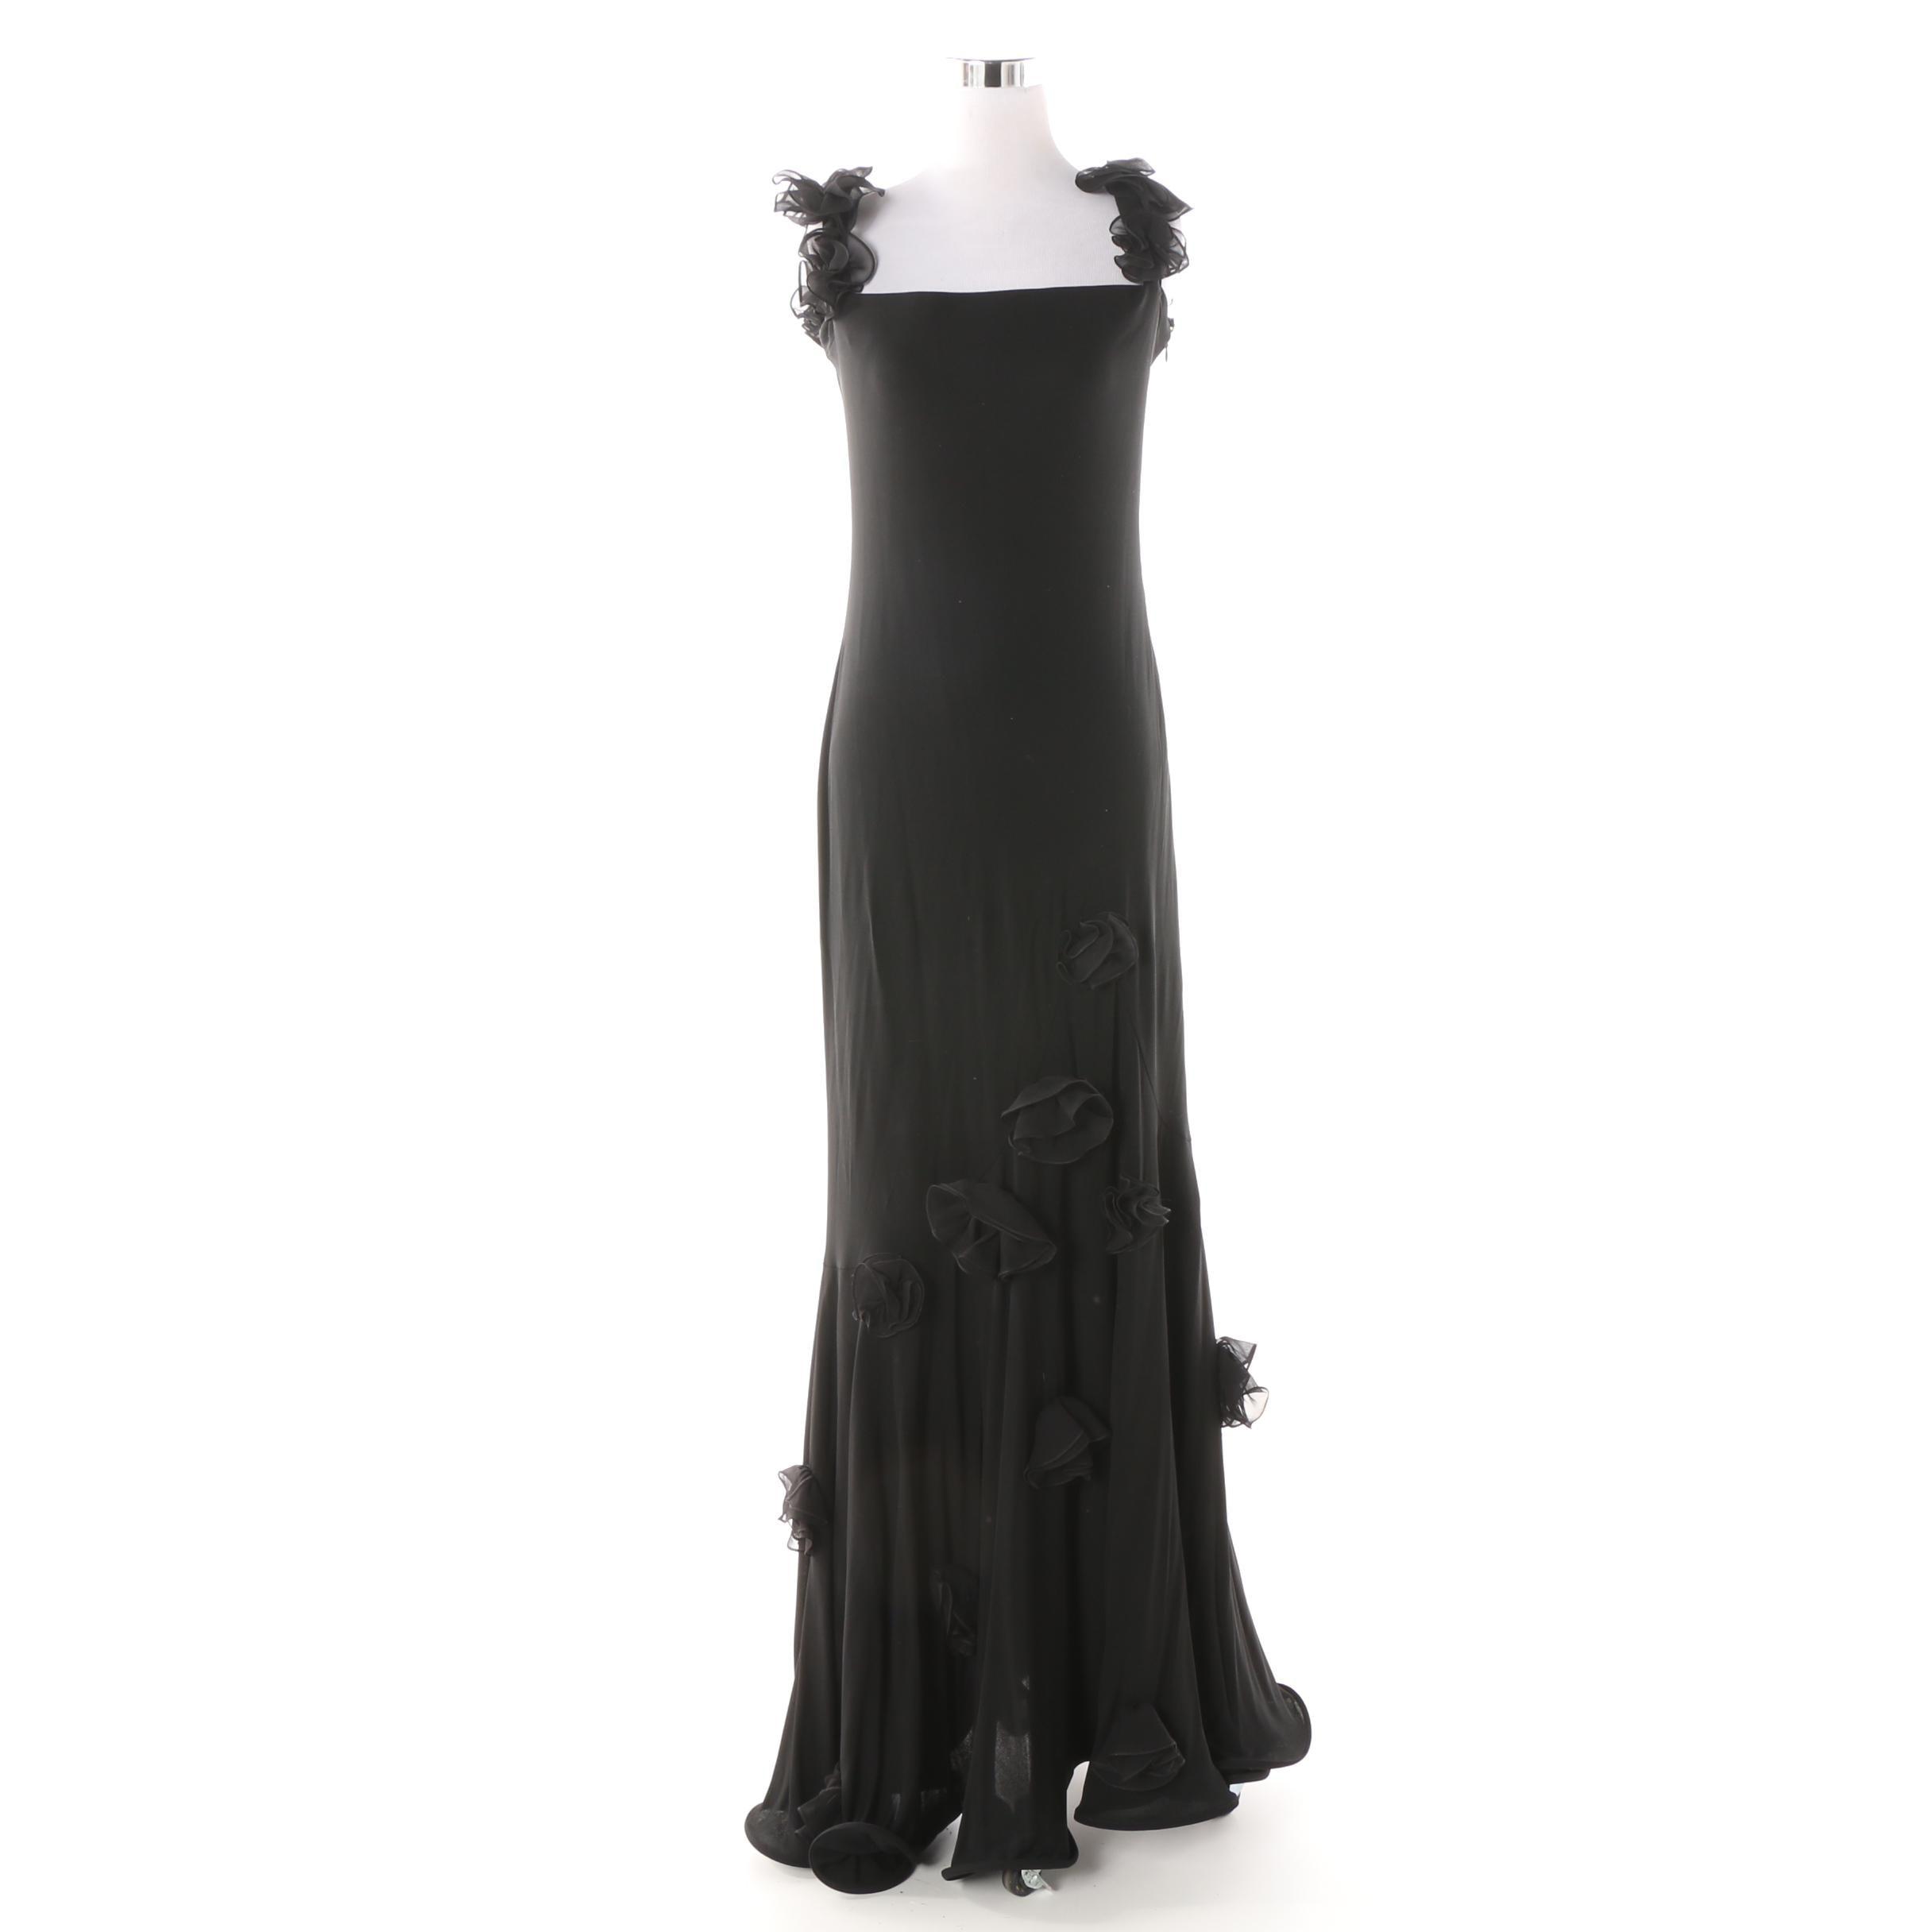 Frivole Black Sleeveless Evening Dress with Applied Fabric Rosettes